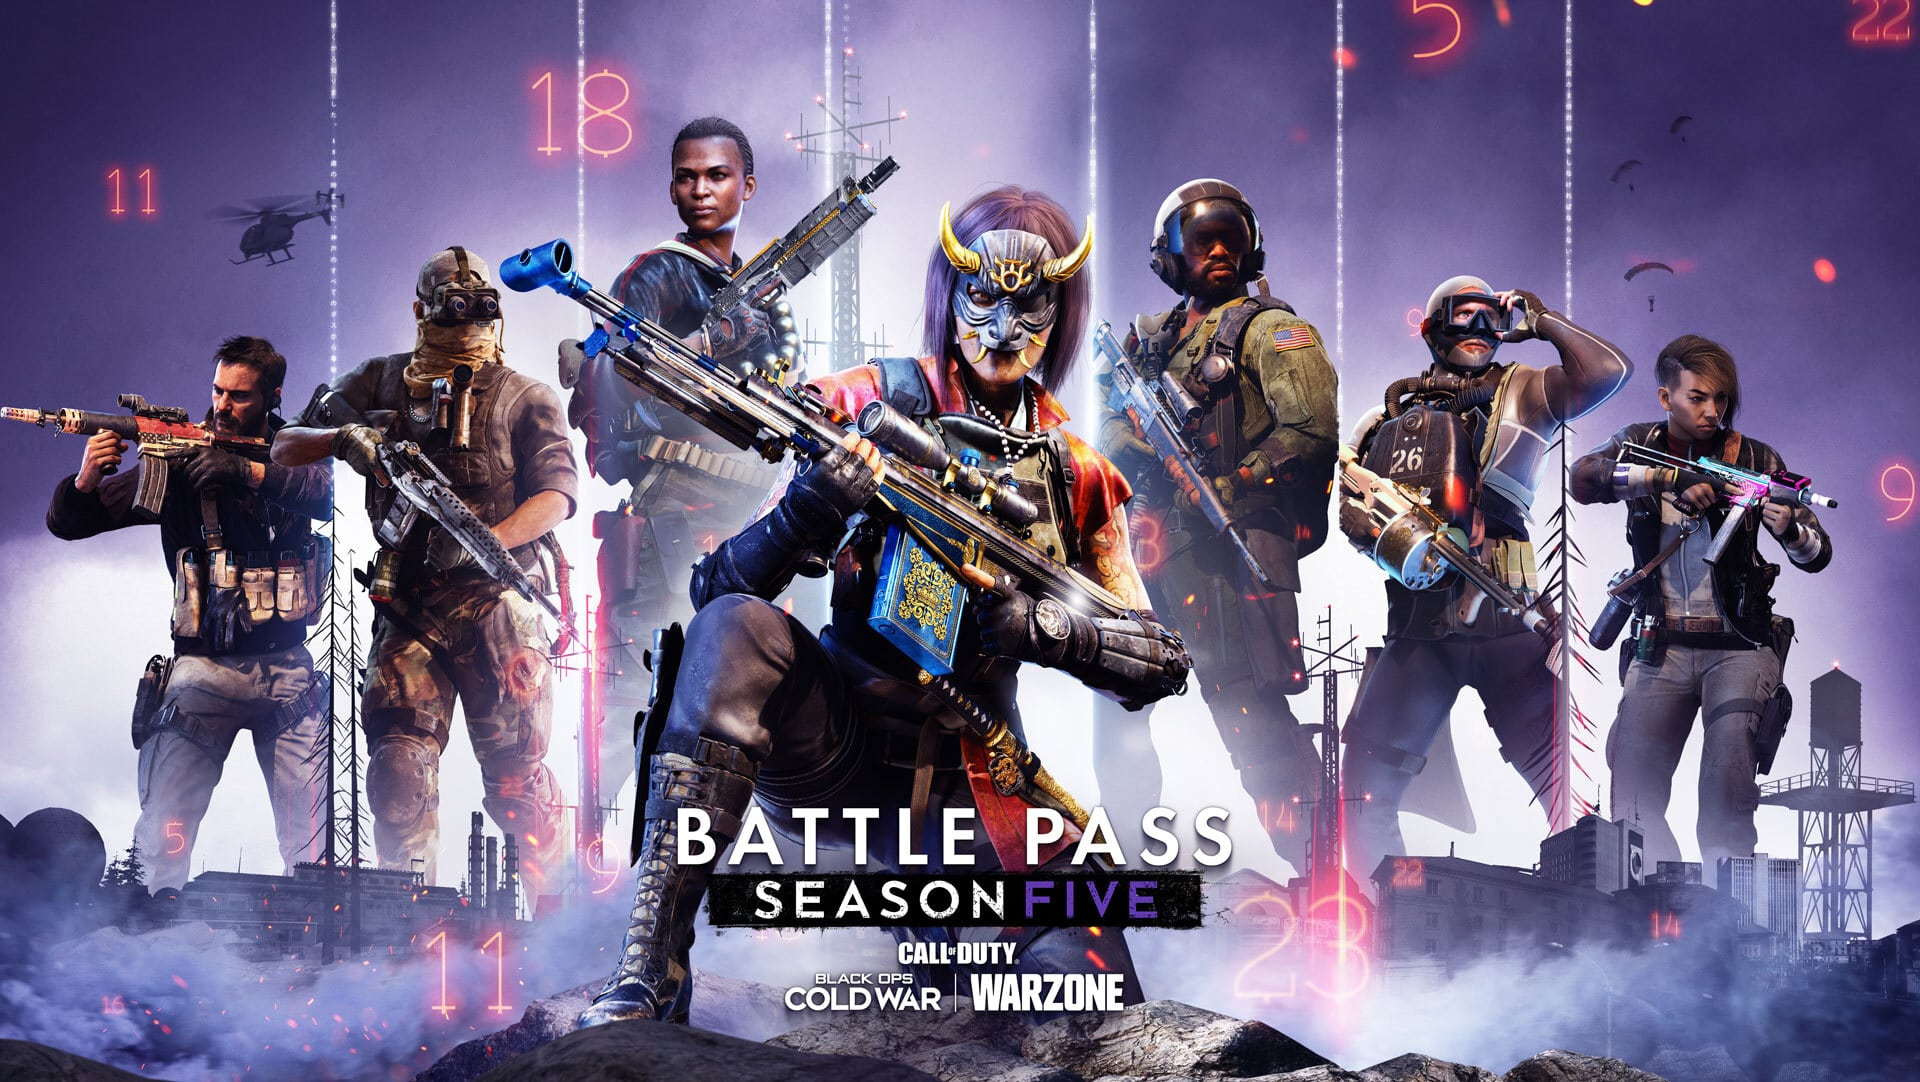 Warzone Season 5 Battle Pass